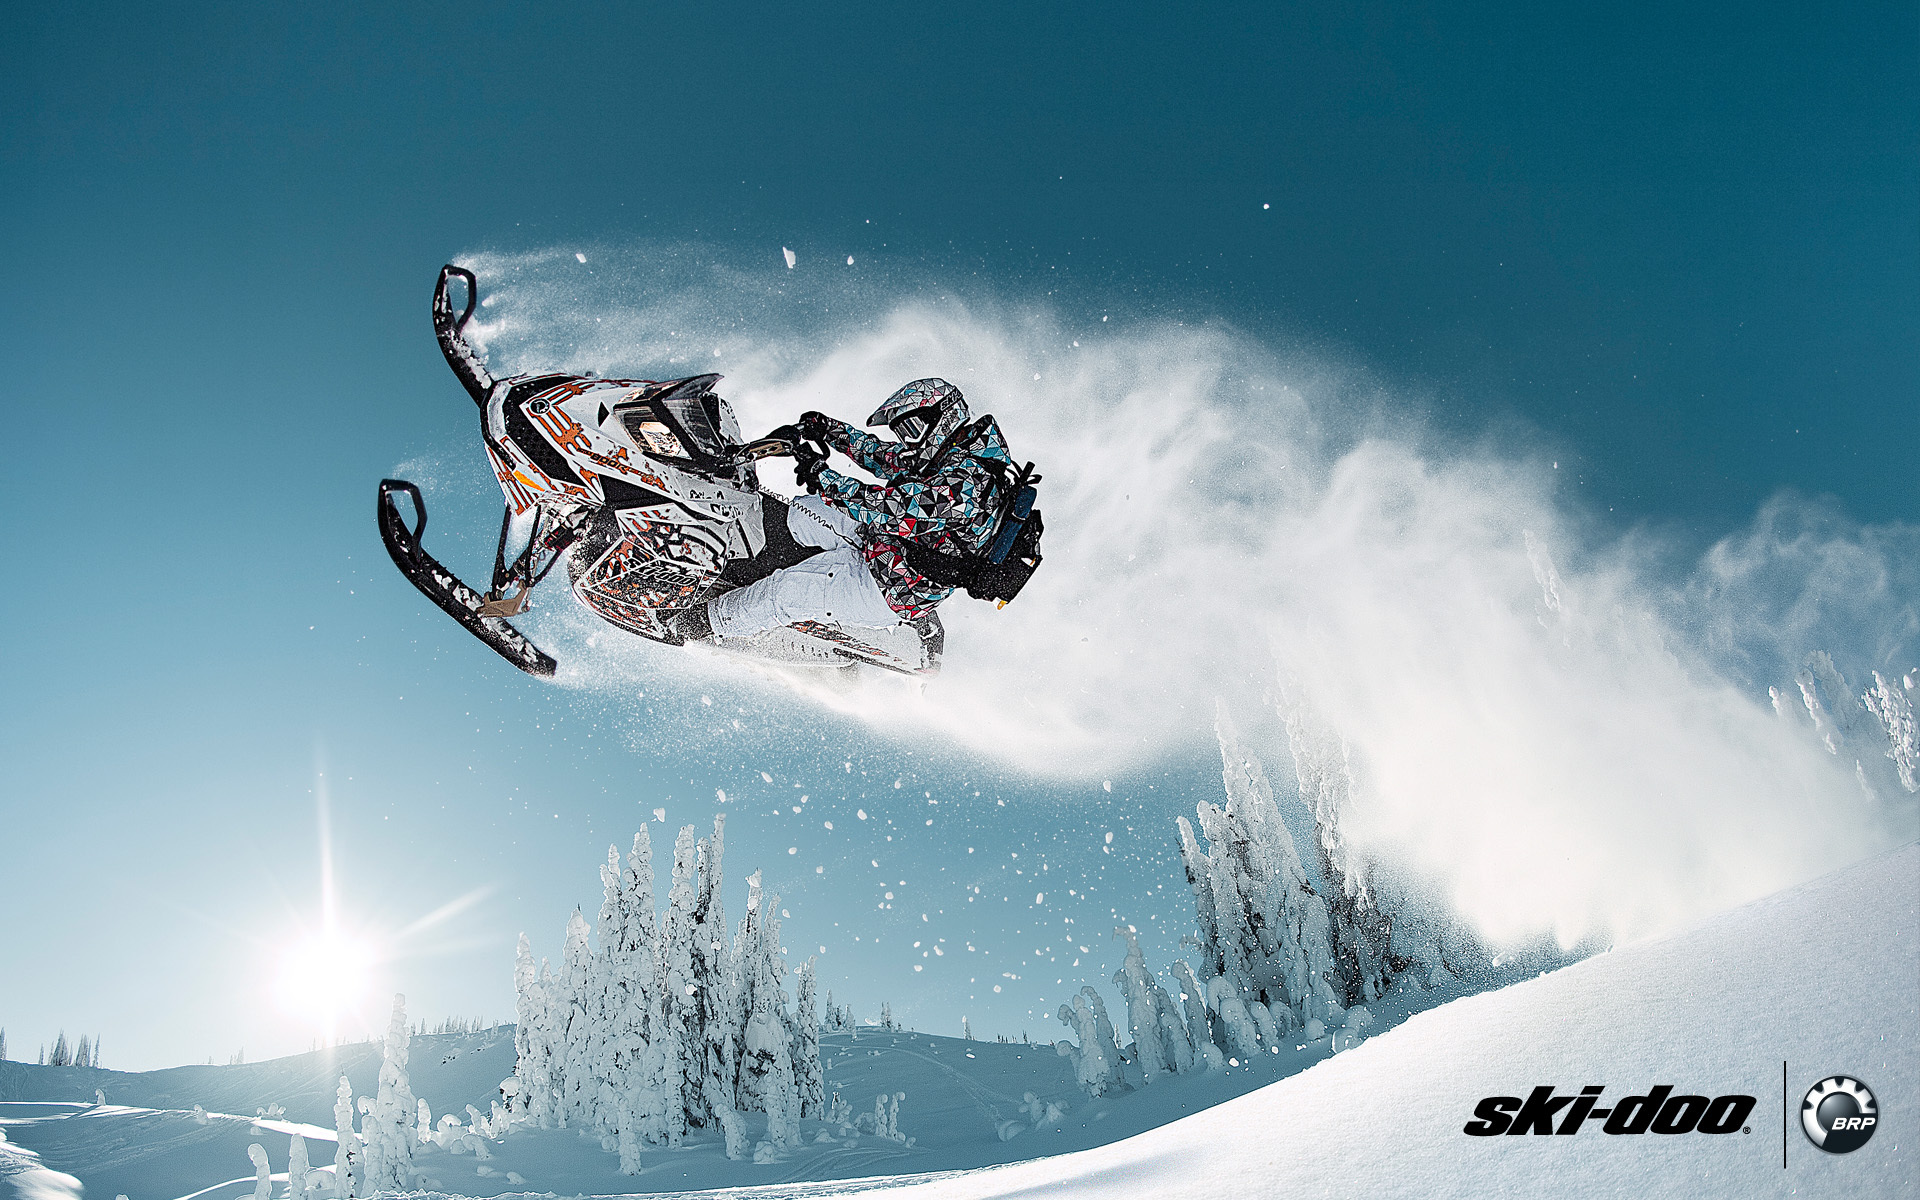 26 <b>Snowmobile HD Wallpapers</b> | <b>Backgrounds</b> - <b>Wallpaper</b> Abyss